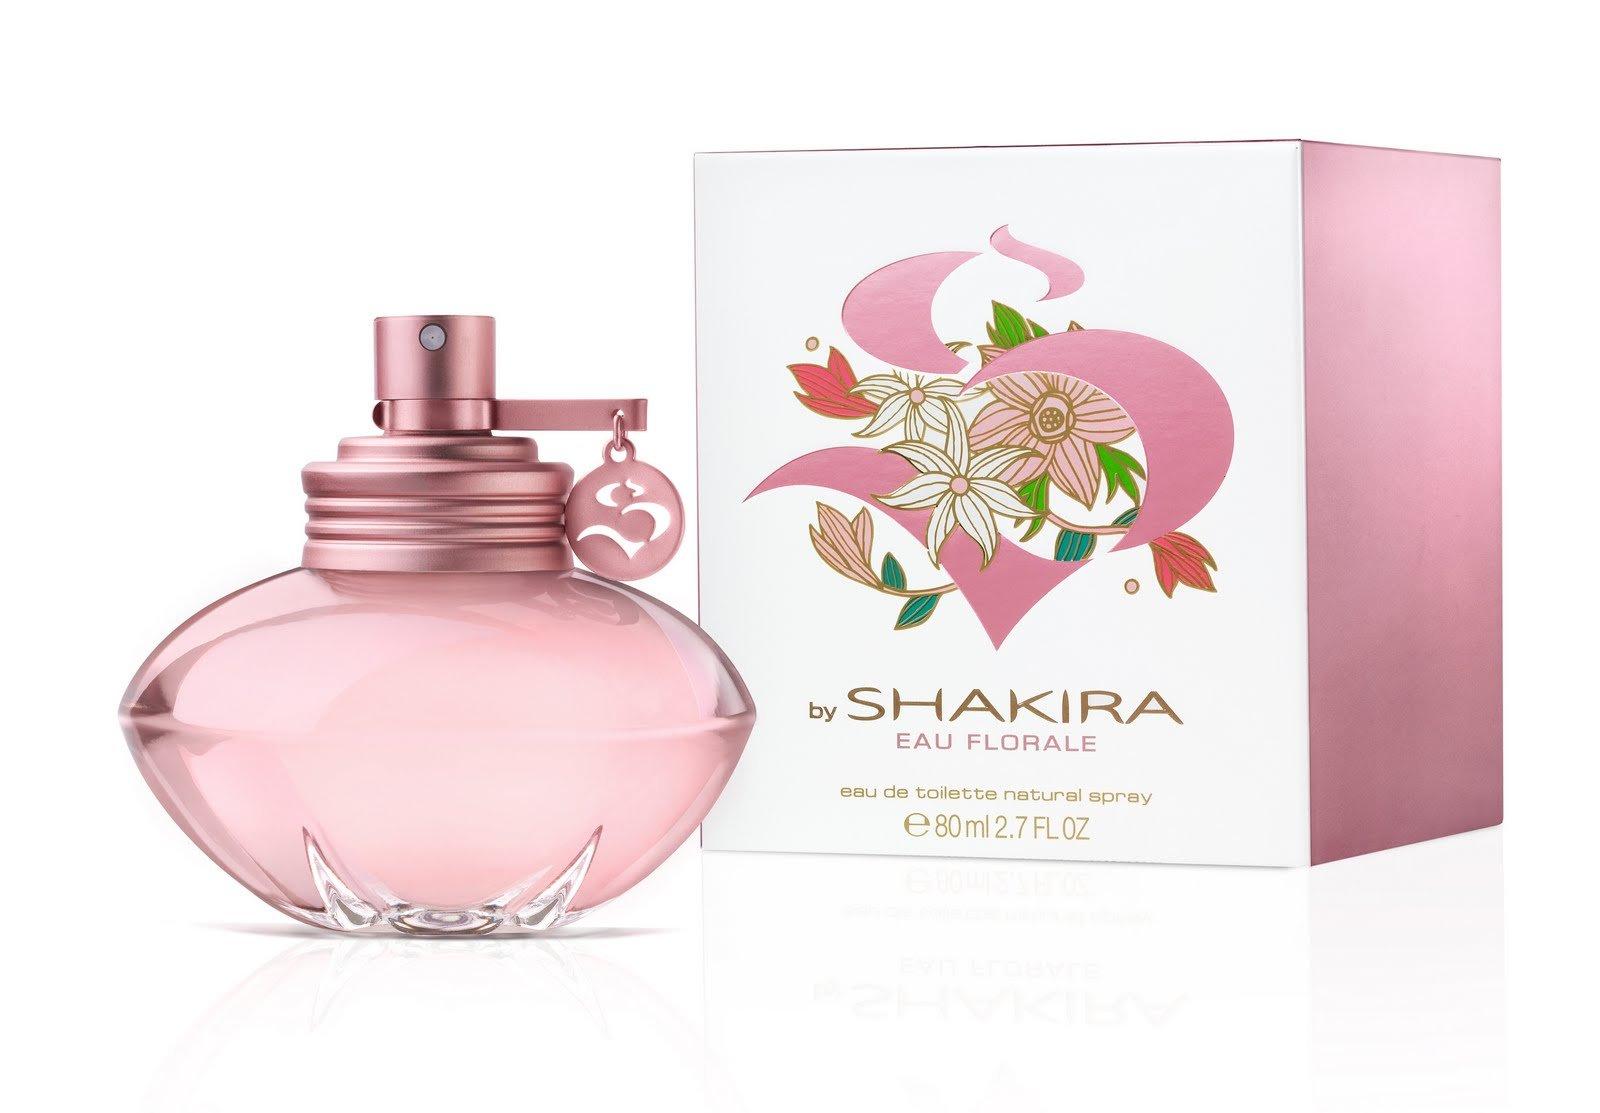 S BY SHAKIRA EAU FLORALE by Shakira EDT SPRAY 2.7 OZ